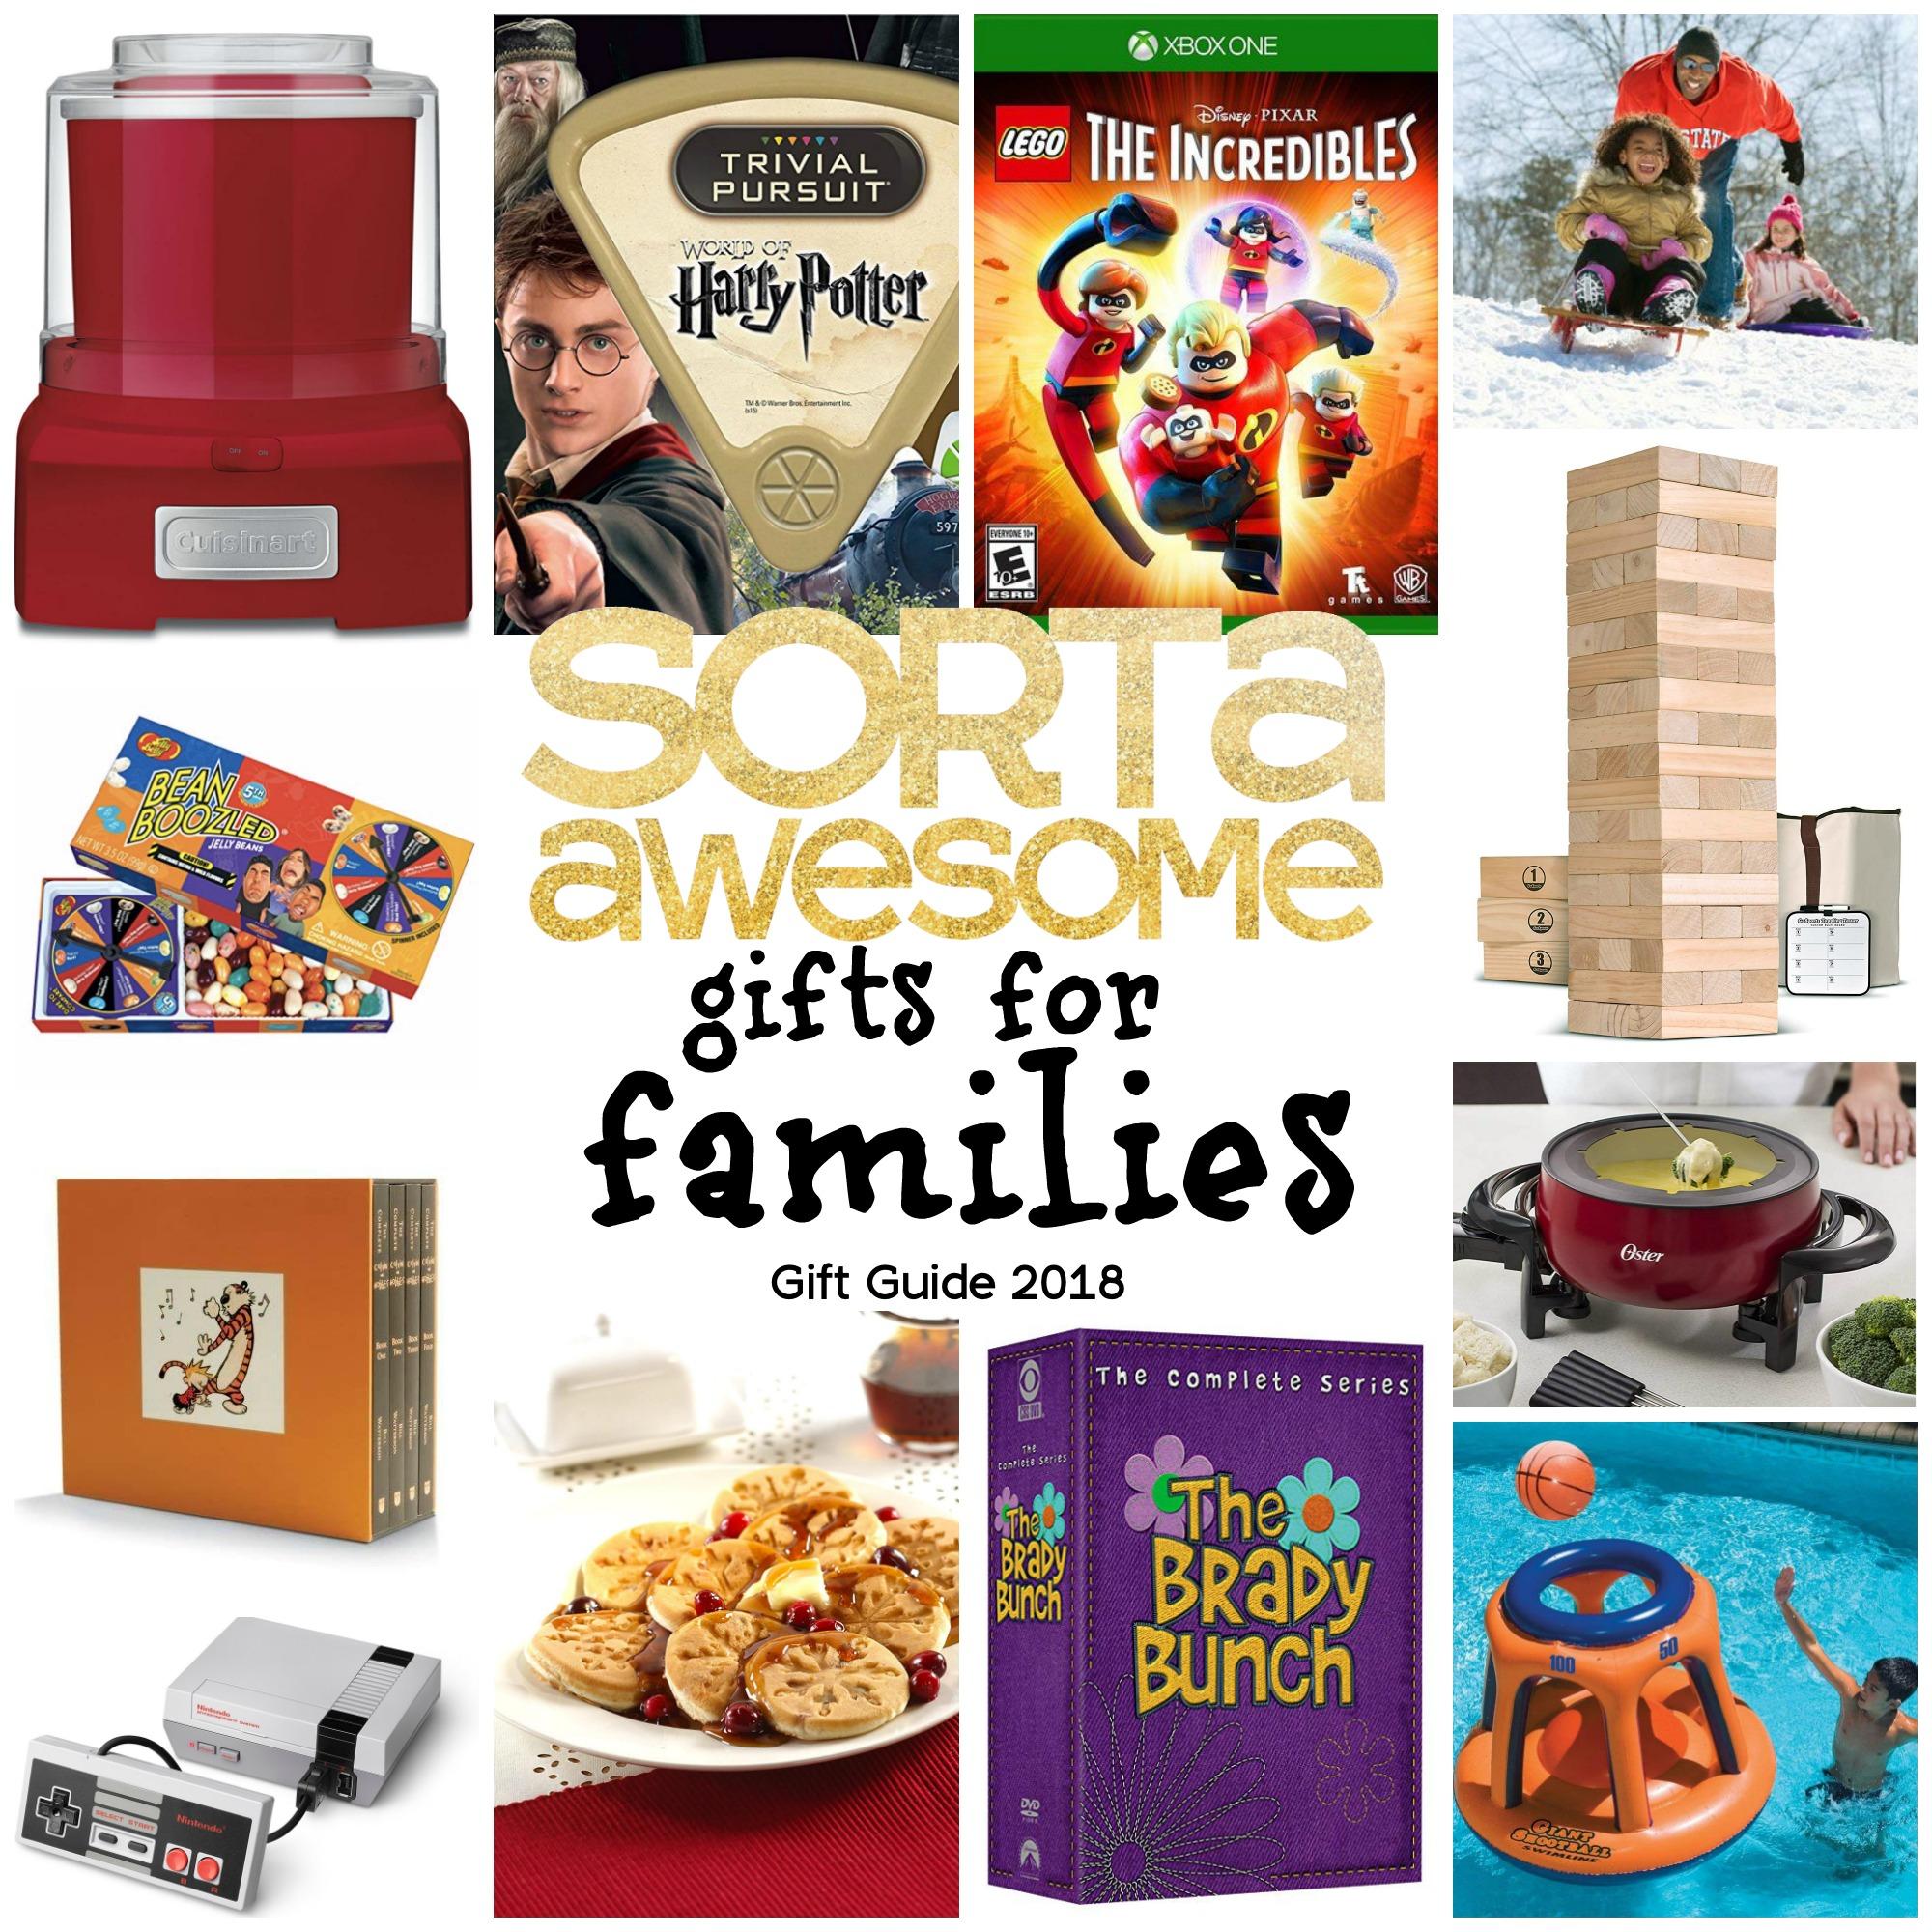 gift guide for families.jpg